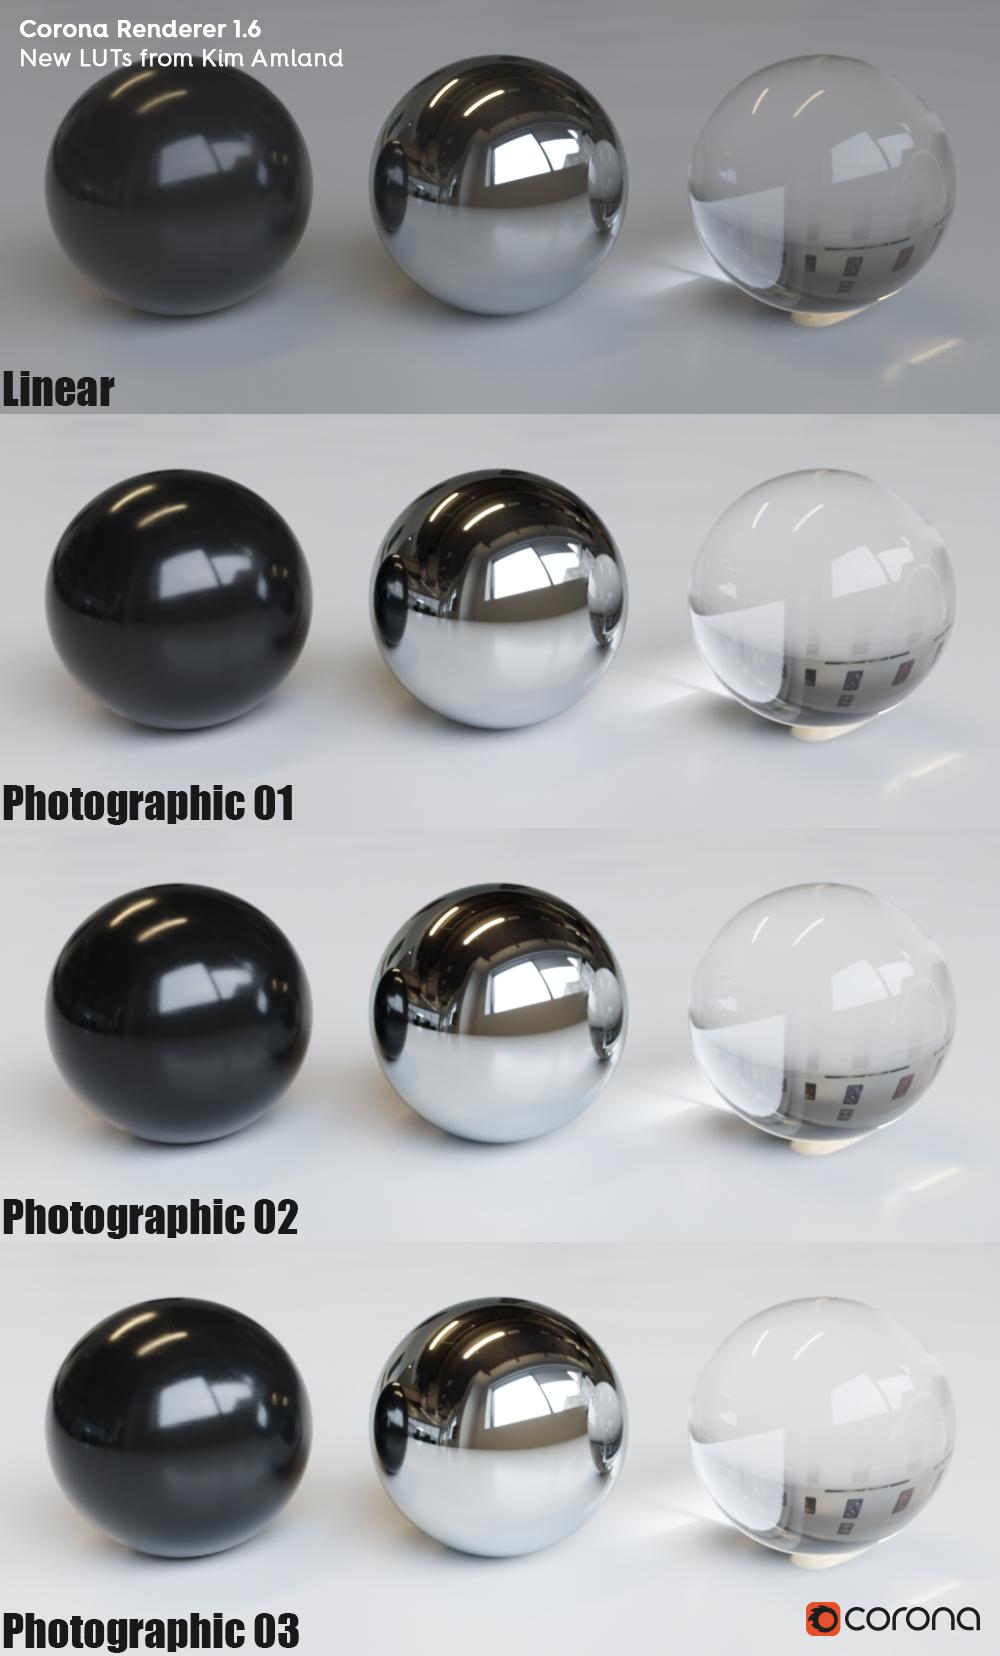 Corona Renderer 1.6 New LUTs